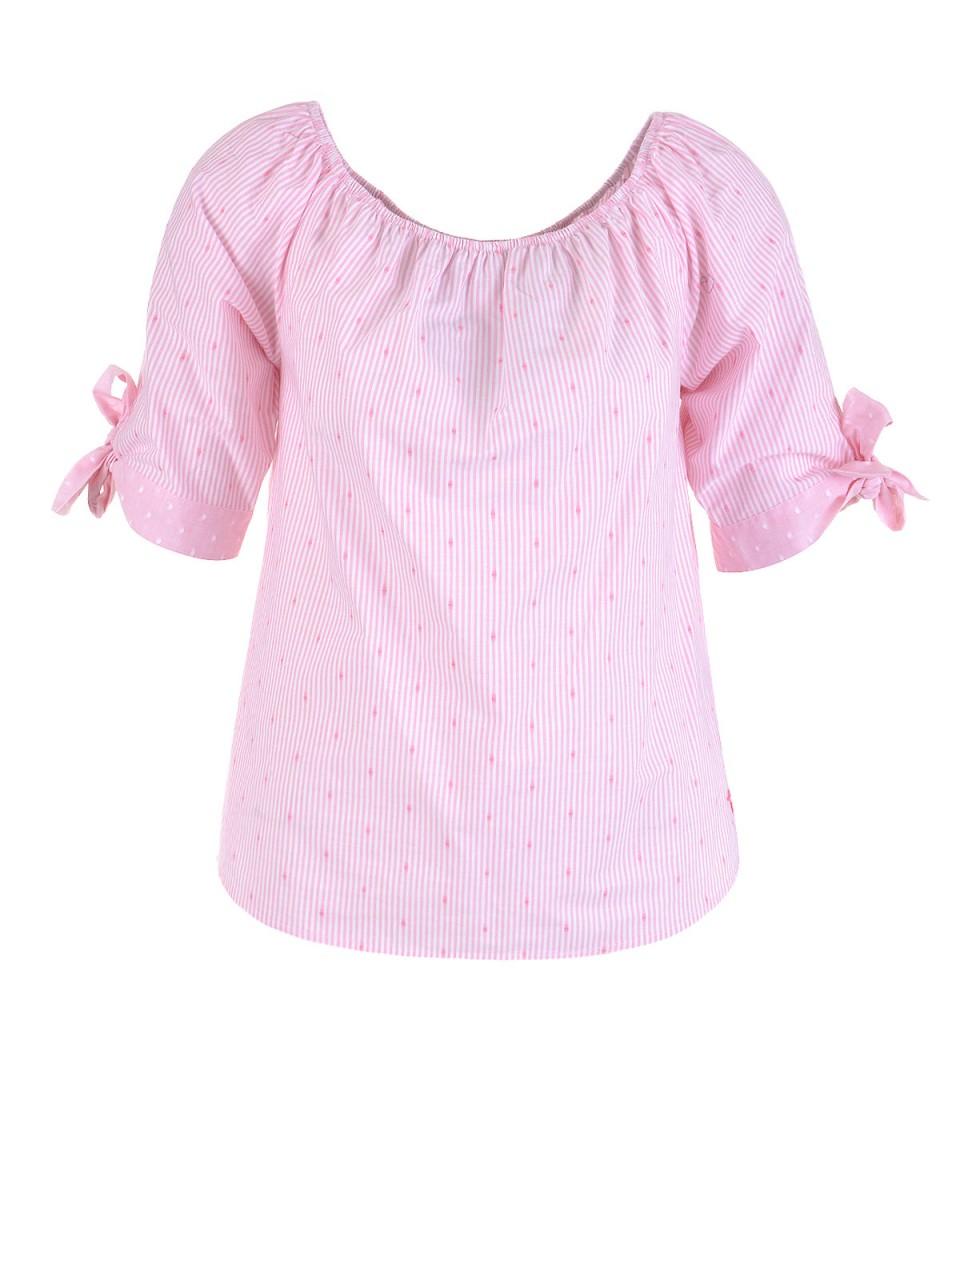 milano-italy-damen-bluse-rosa-wei-szlig-, 39.95 EUR @ designermode-com-mode